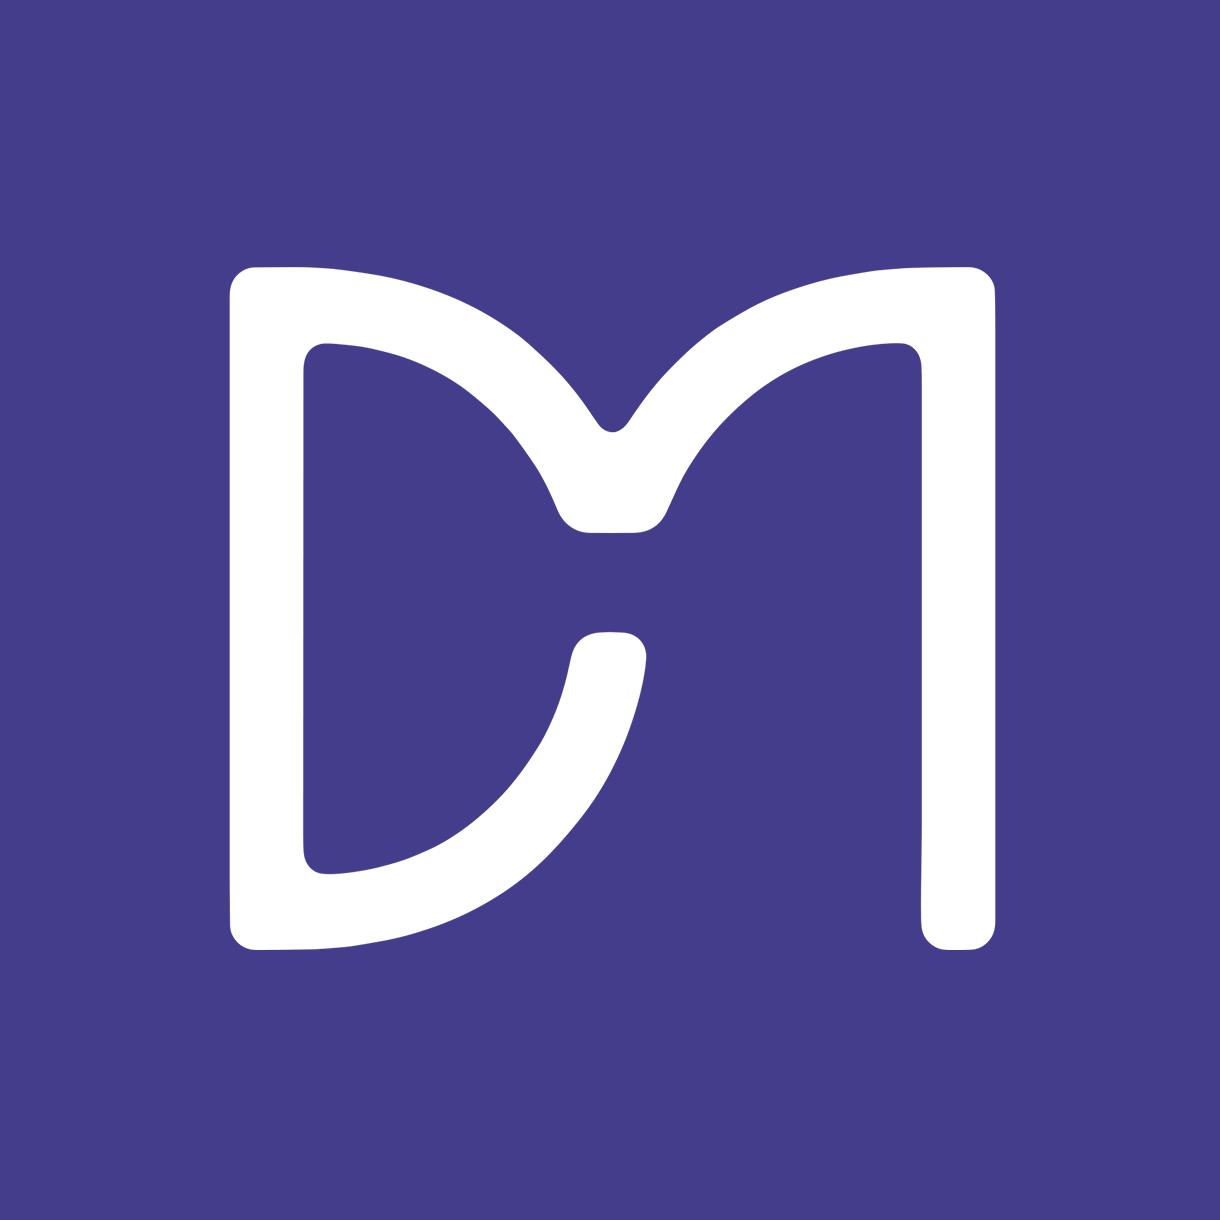 dm_imagecarreV2